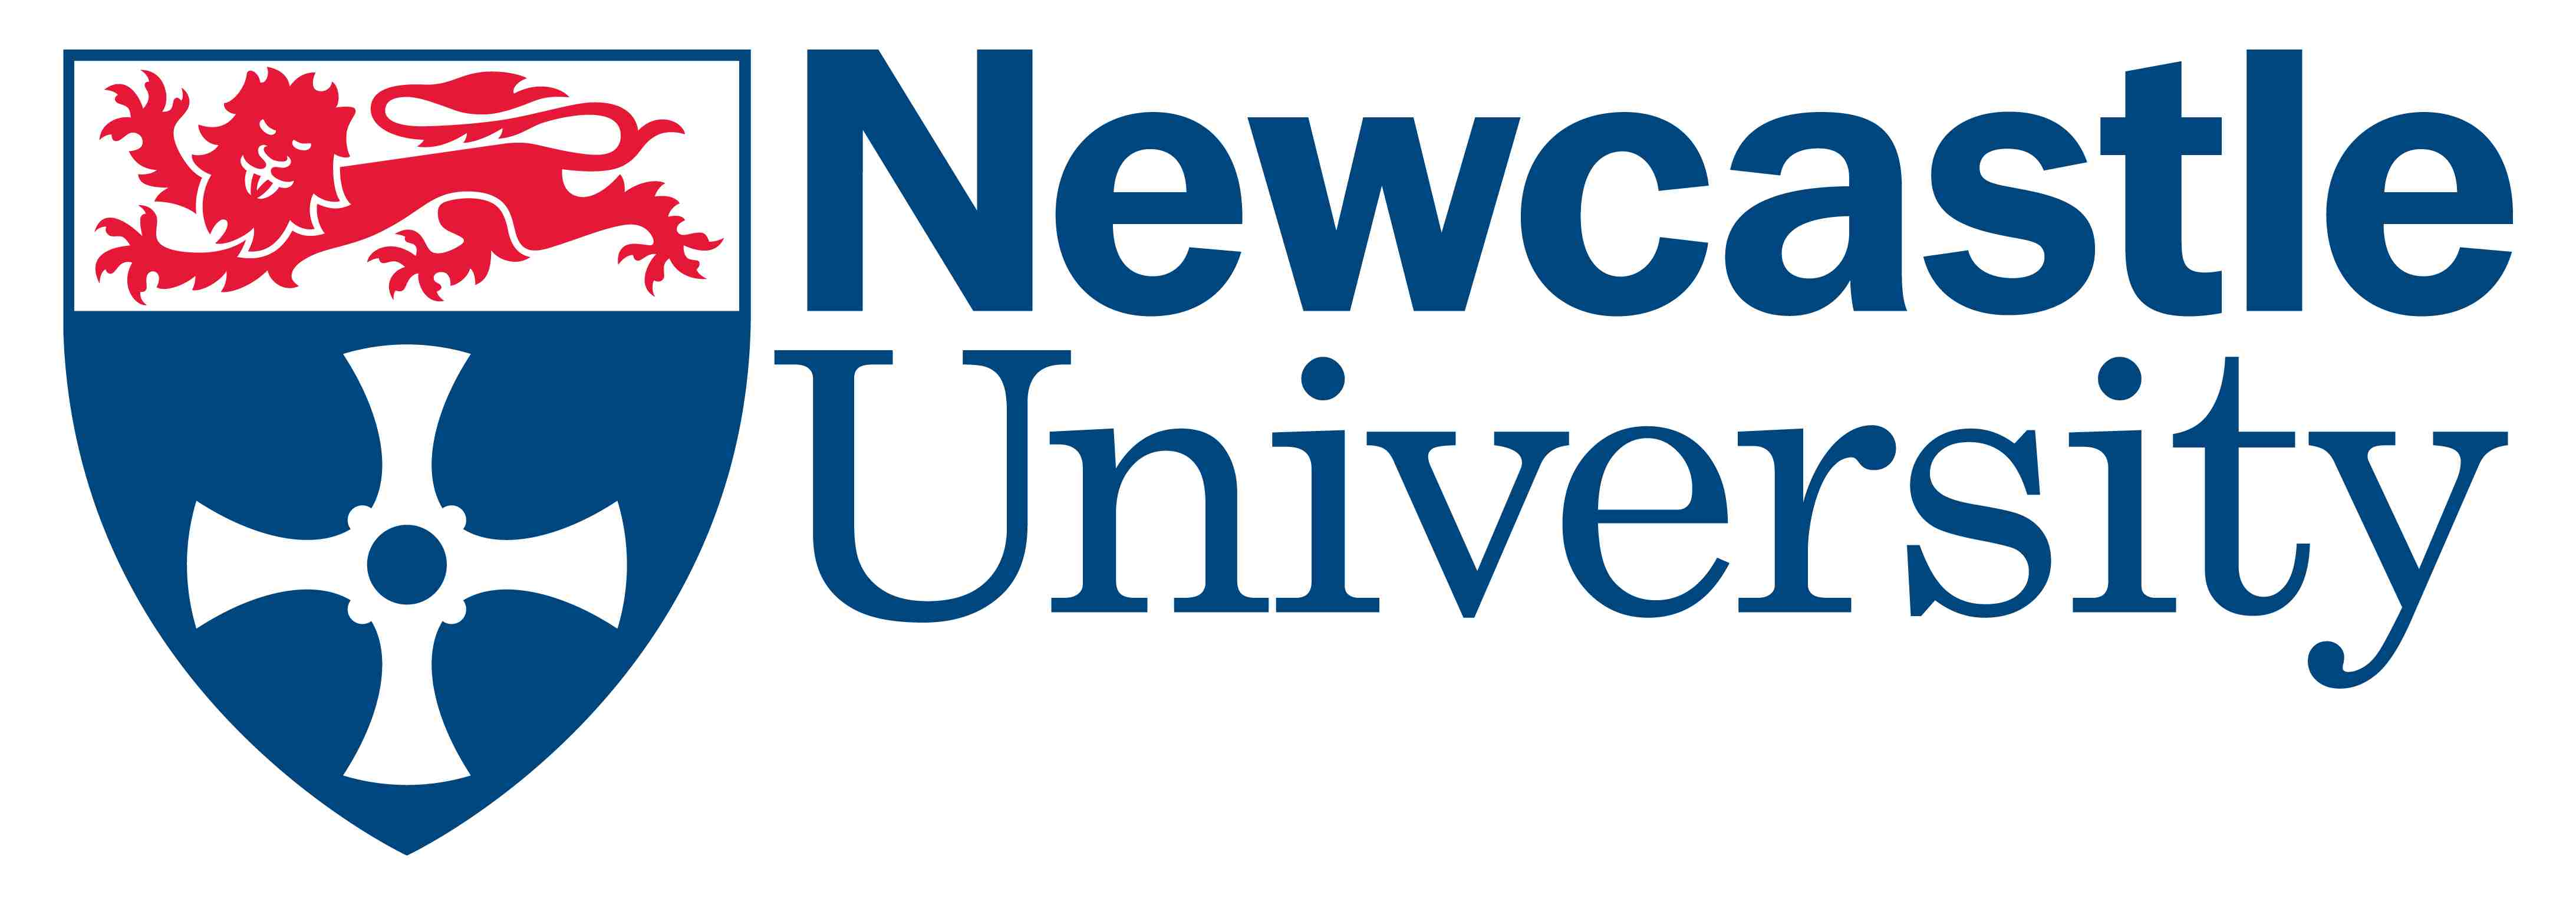 Newcastle University-logo